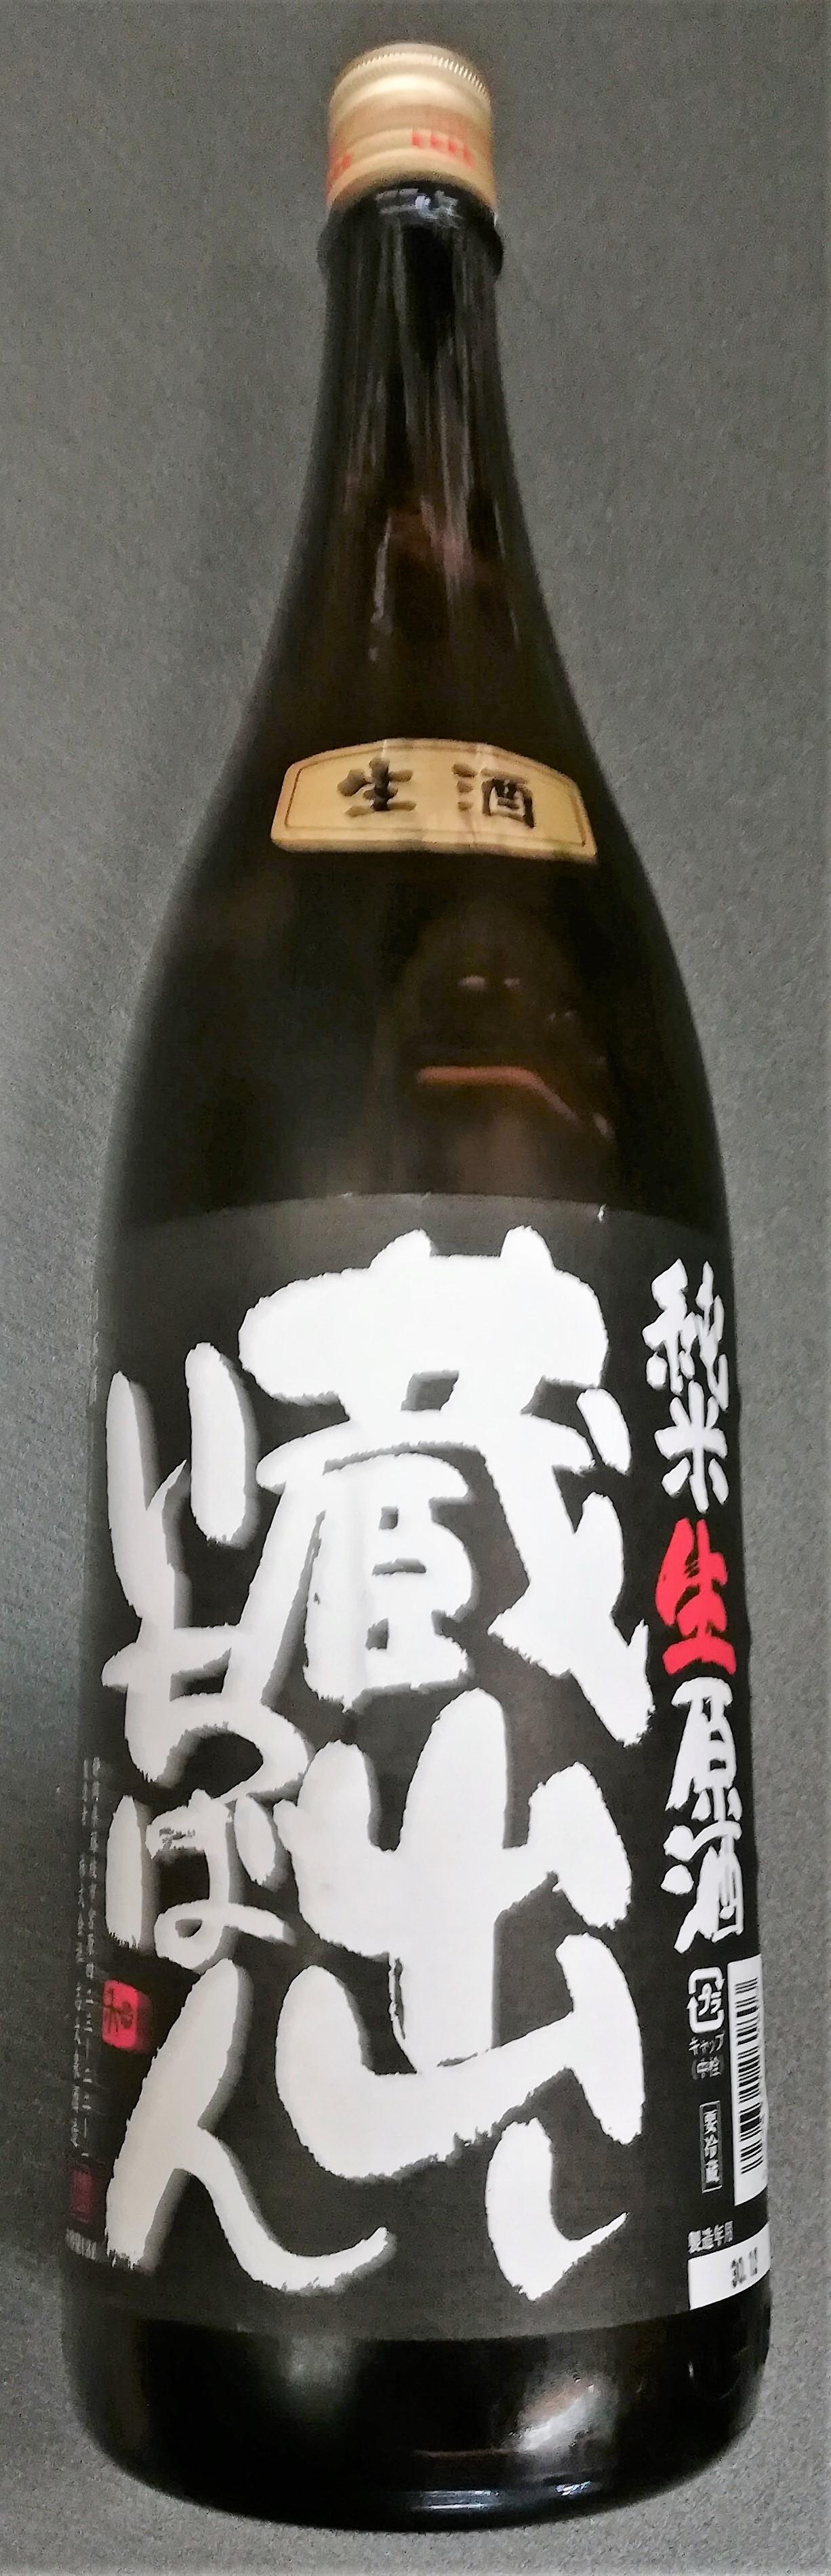 shidaizumijunmainamaT.jpg